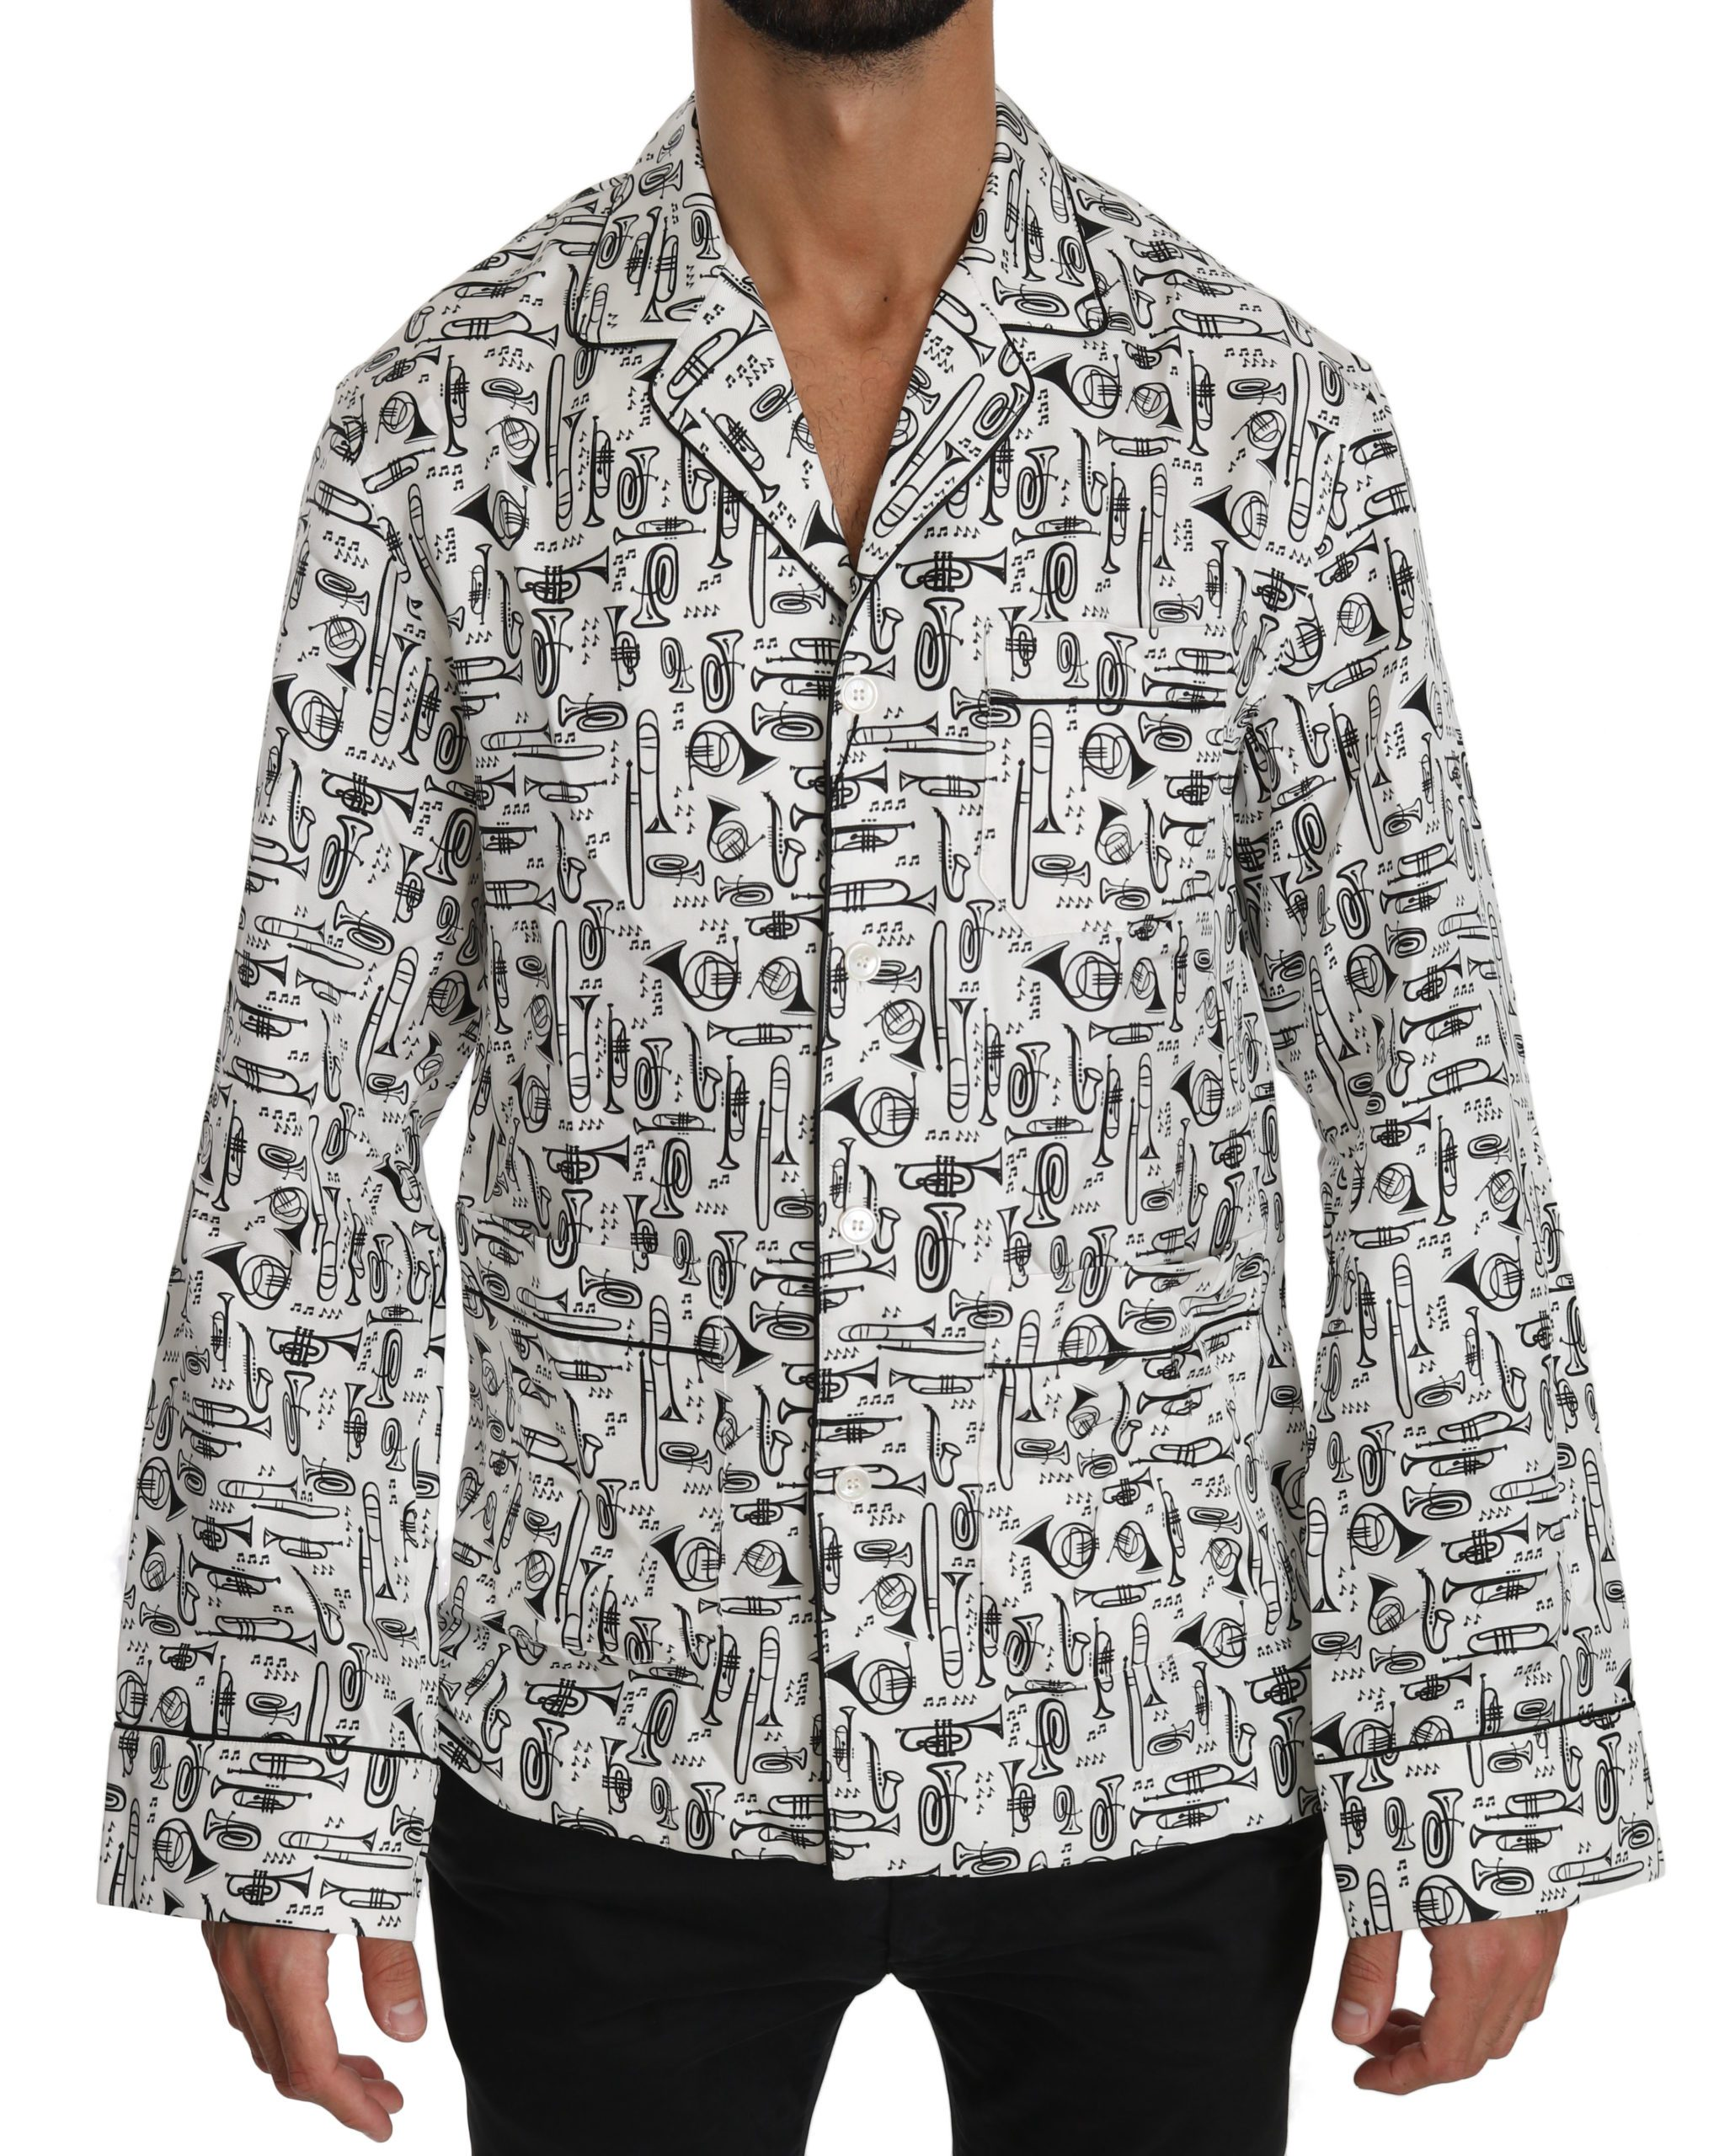 Dolce & Gabbana Men's Musical Instrument Silk Shirt White TSH4008 - IT37   XS